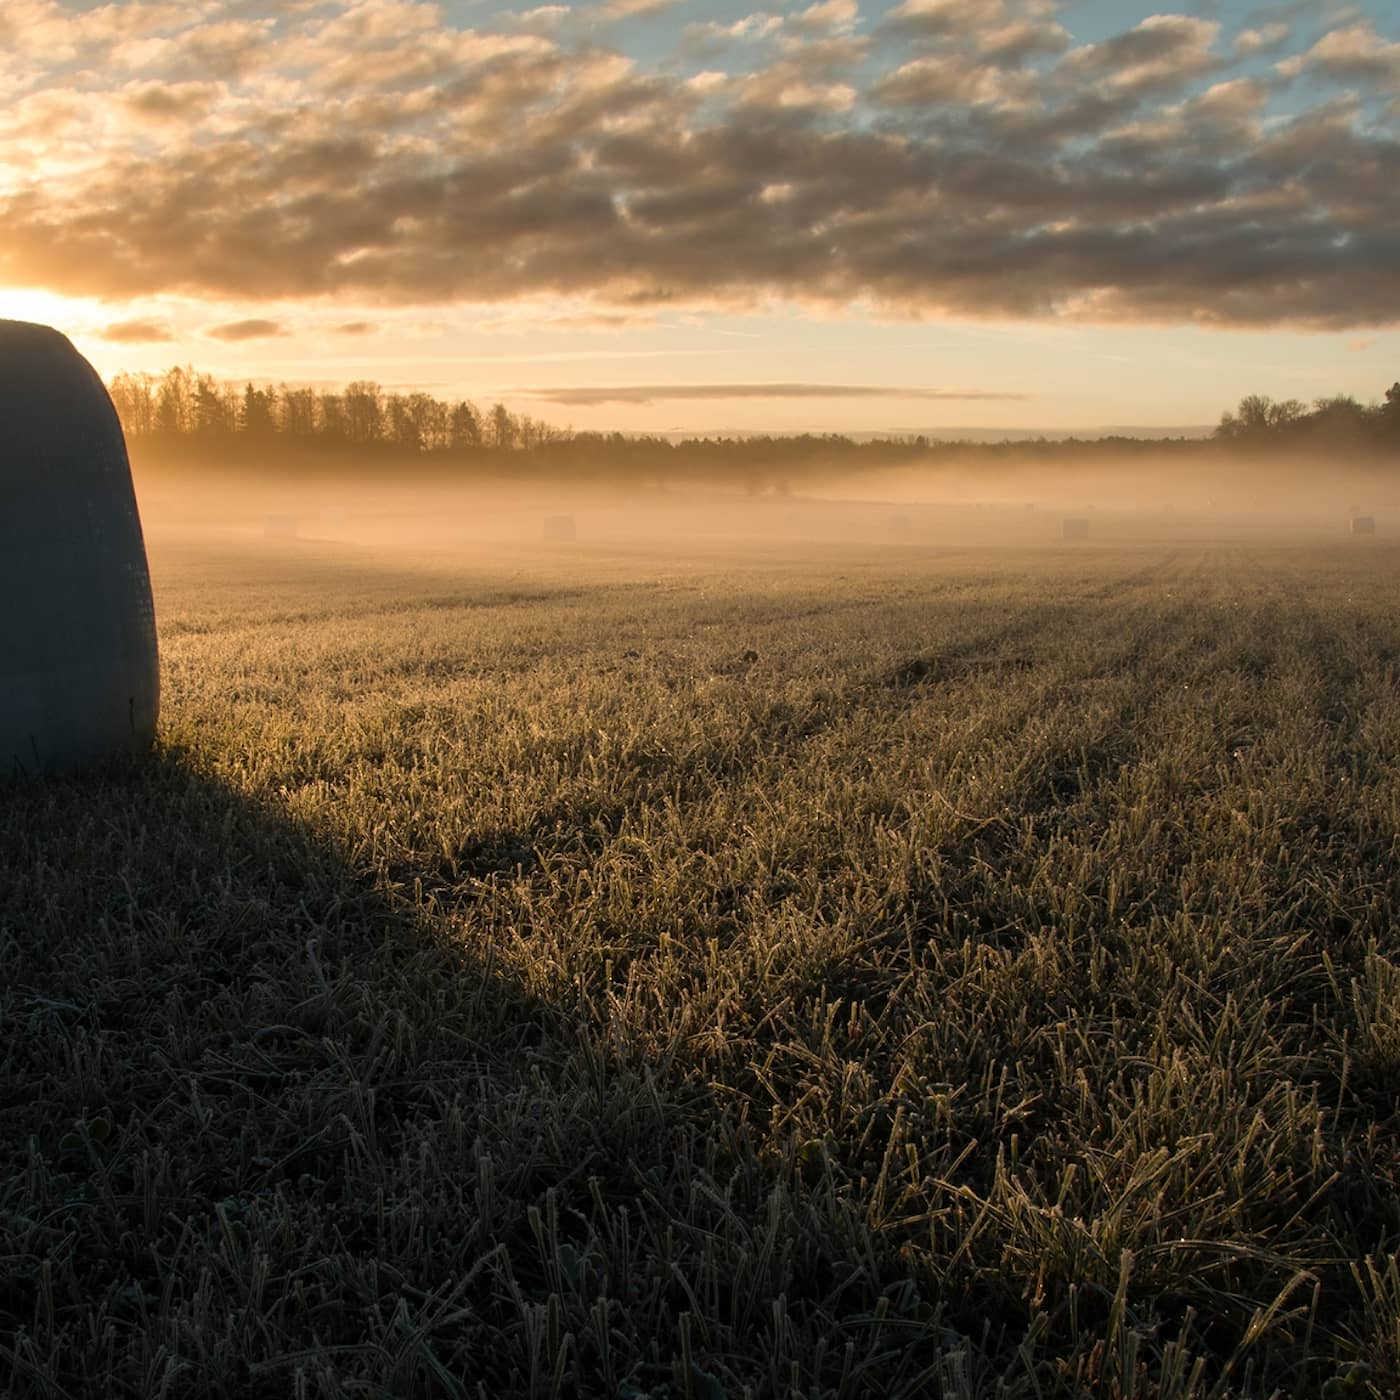 Är svenskt jordbruk bidragsberoende?